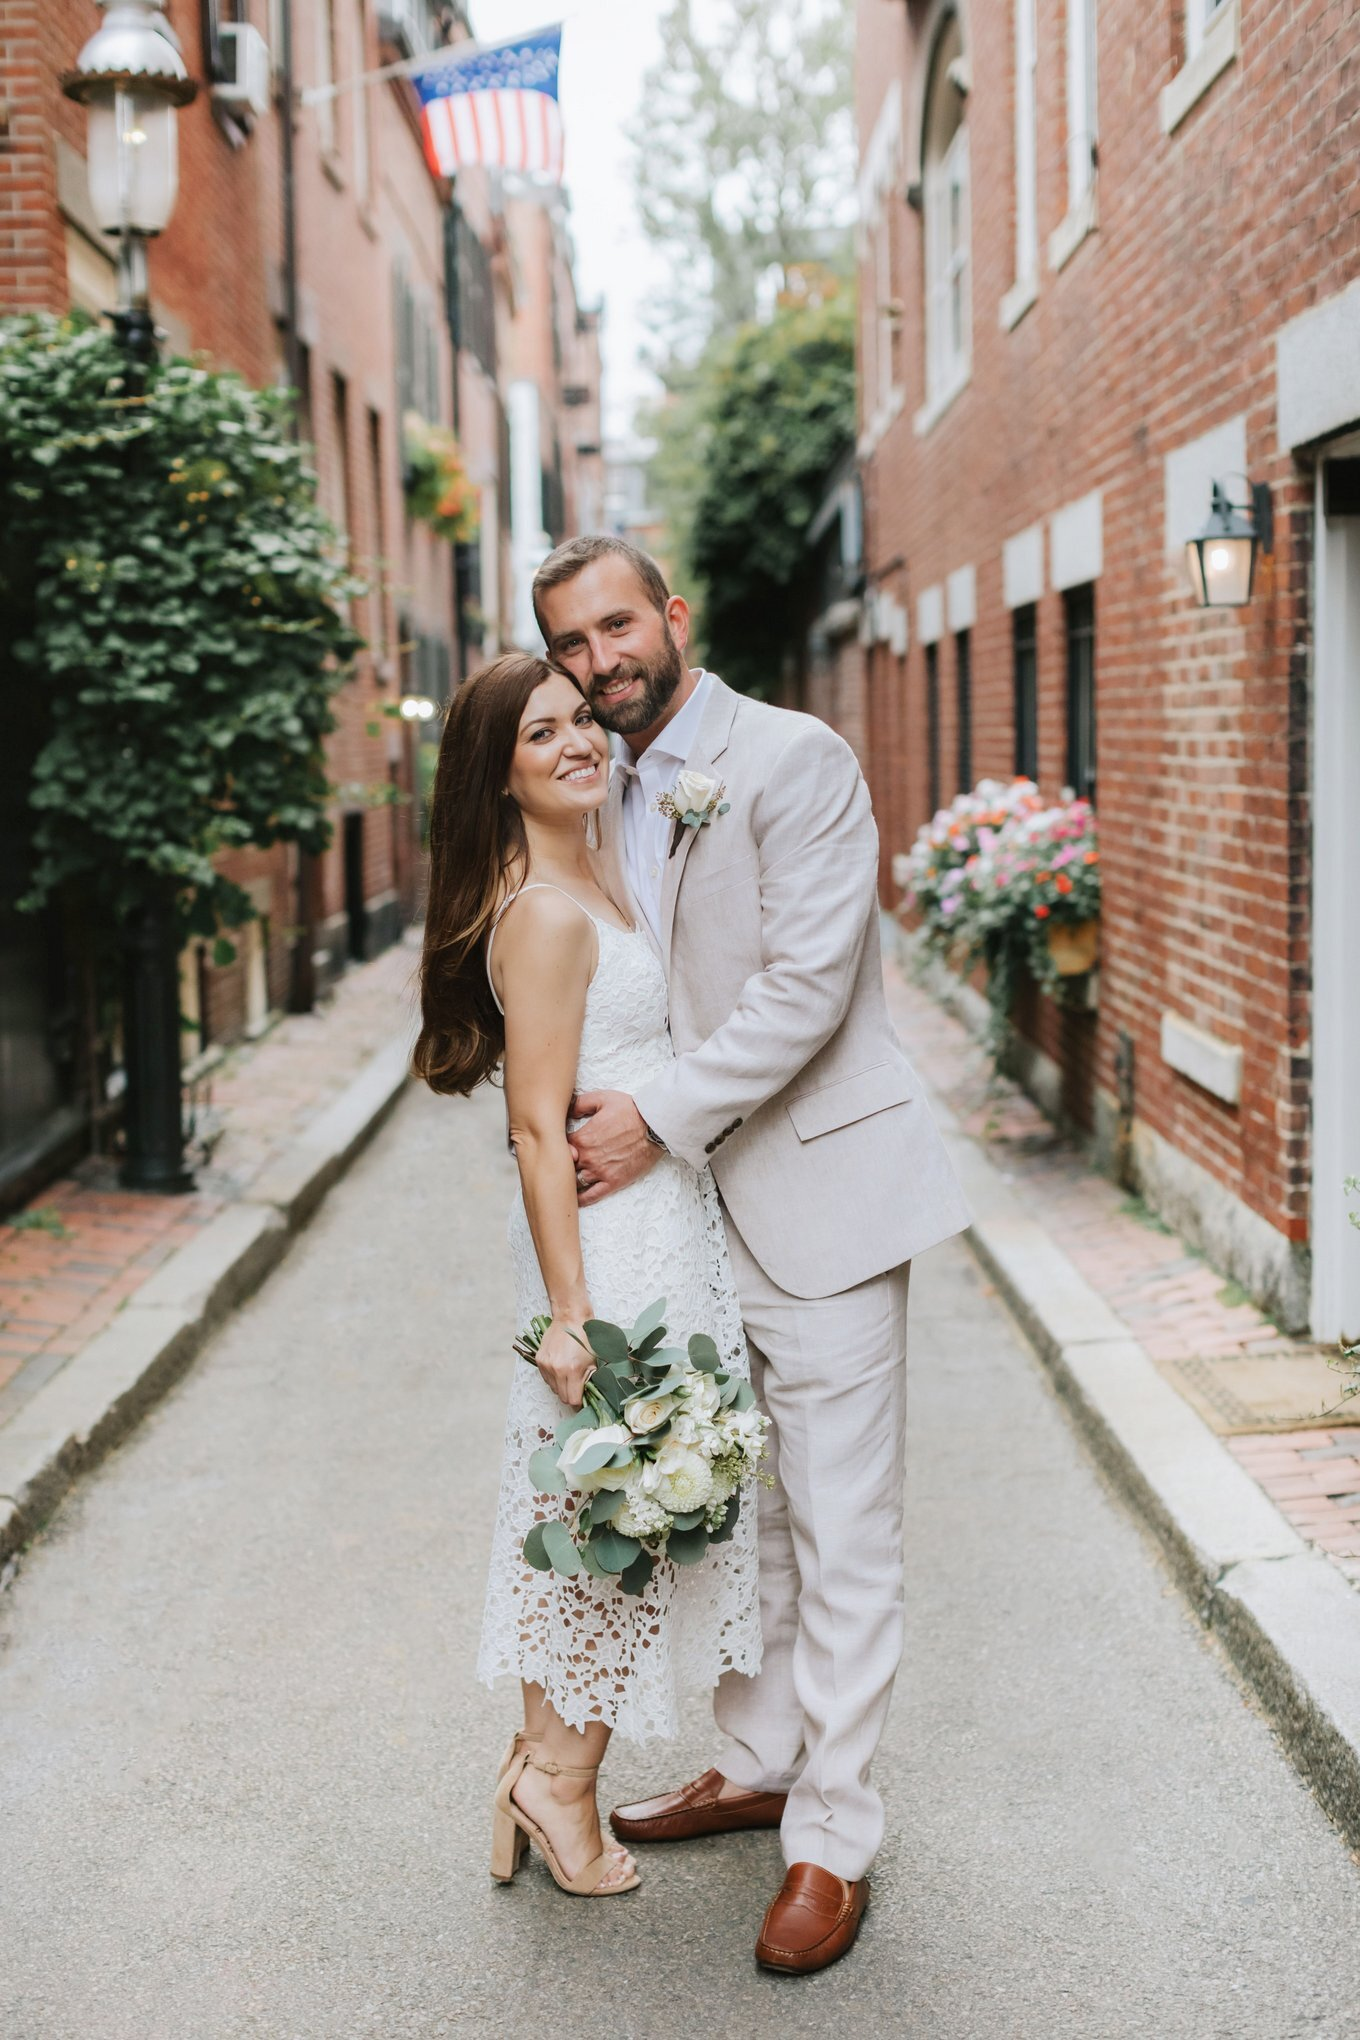 Boston-City-Hall-Beacon-Hill-Wedding-019.JPG